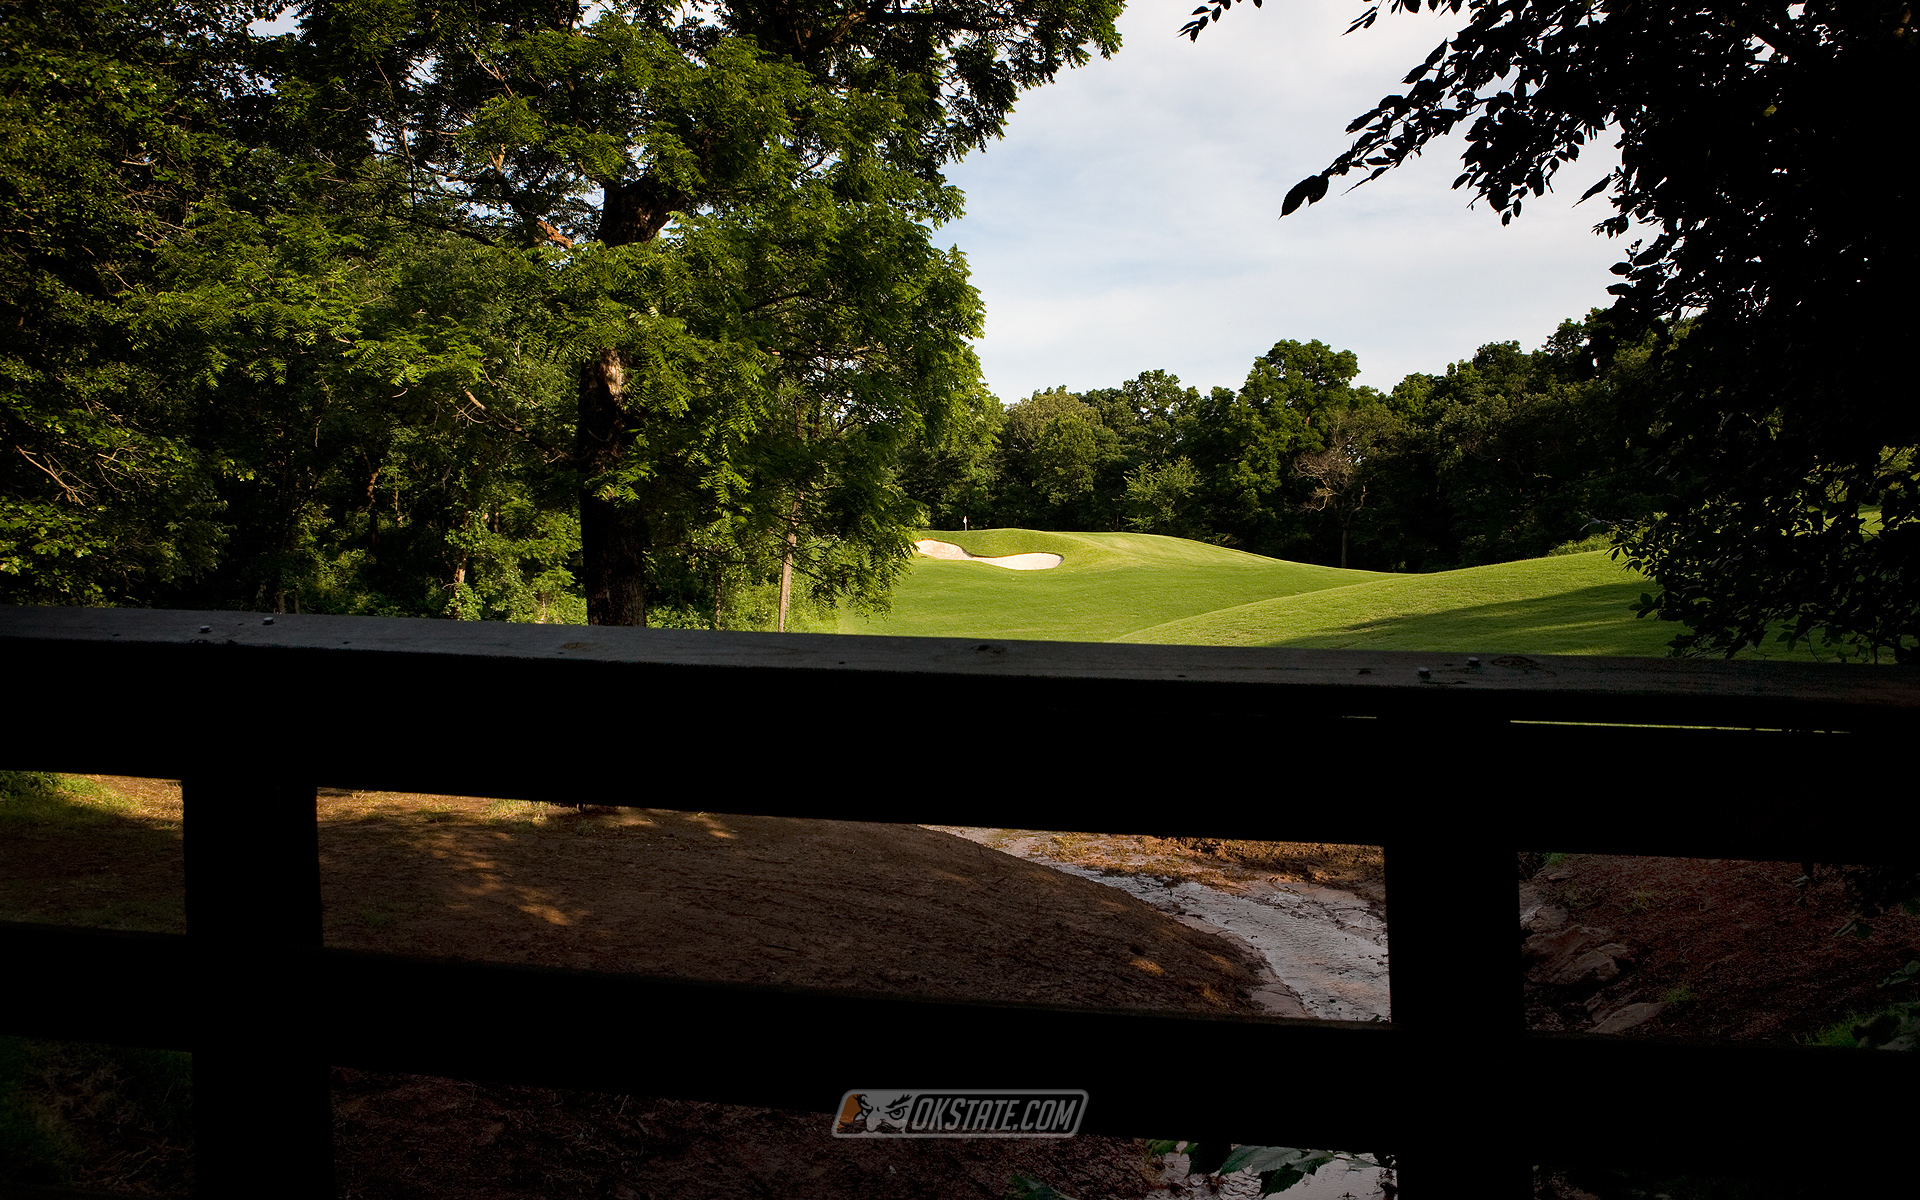 wwwokstatecomsportsm golfspec relokst m golf wallpapershtml 1920x1200